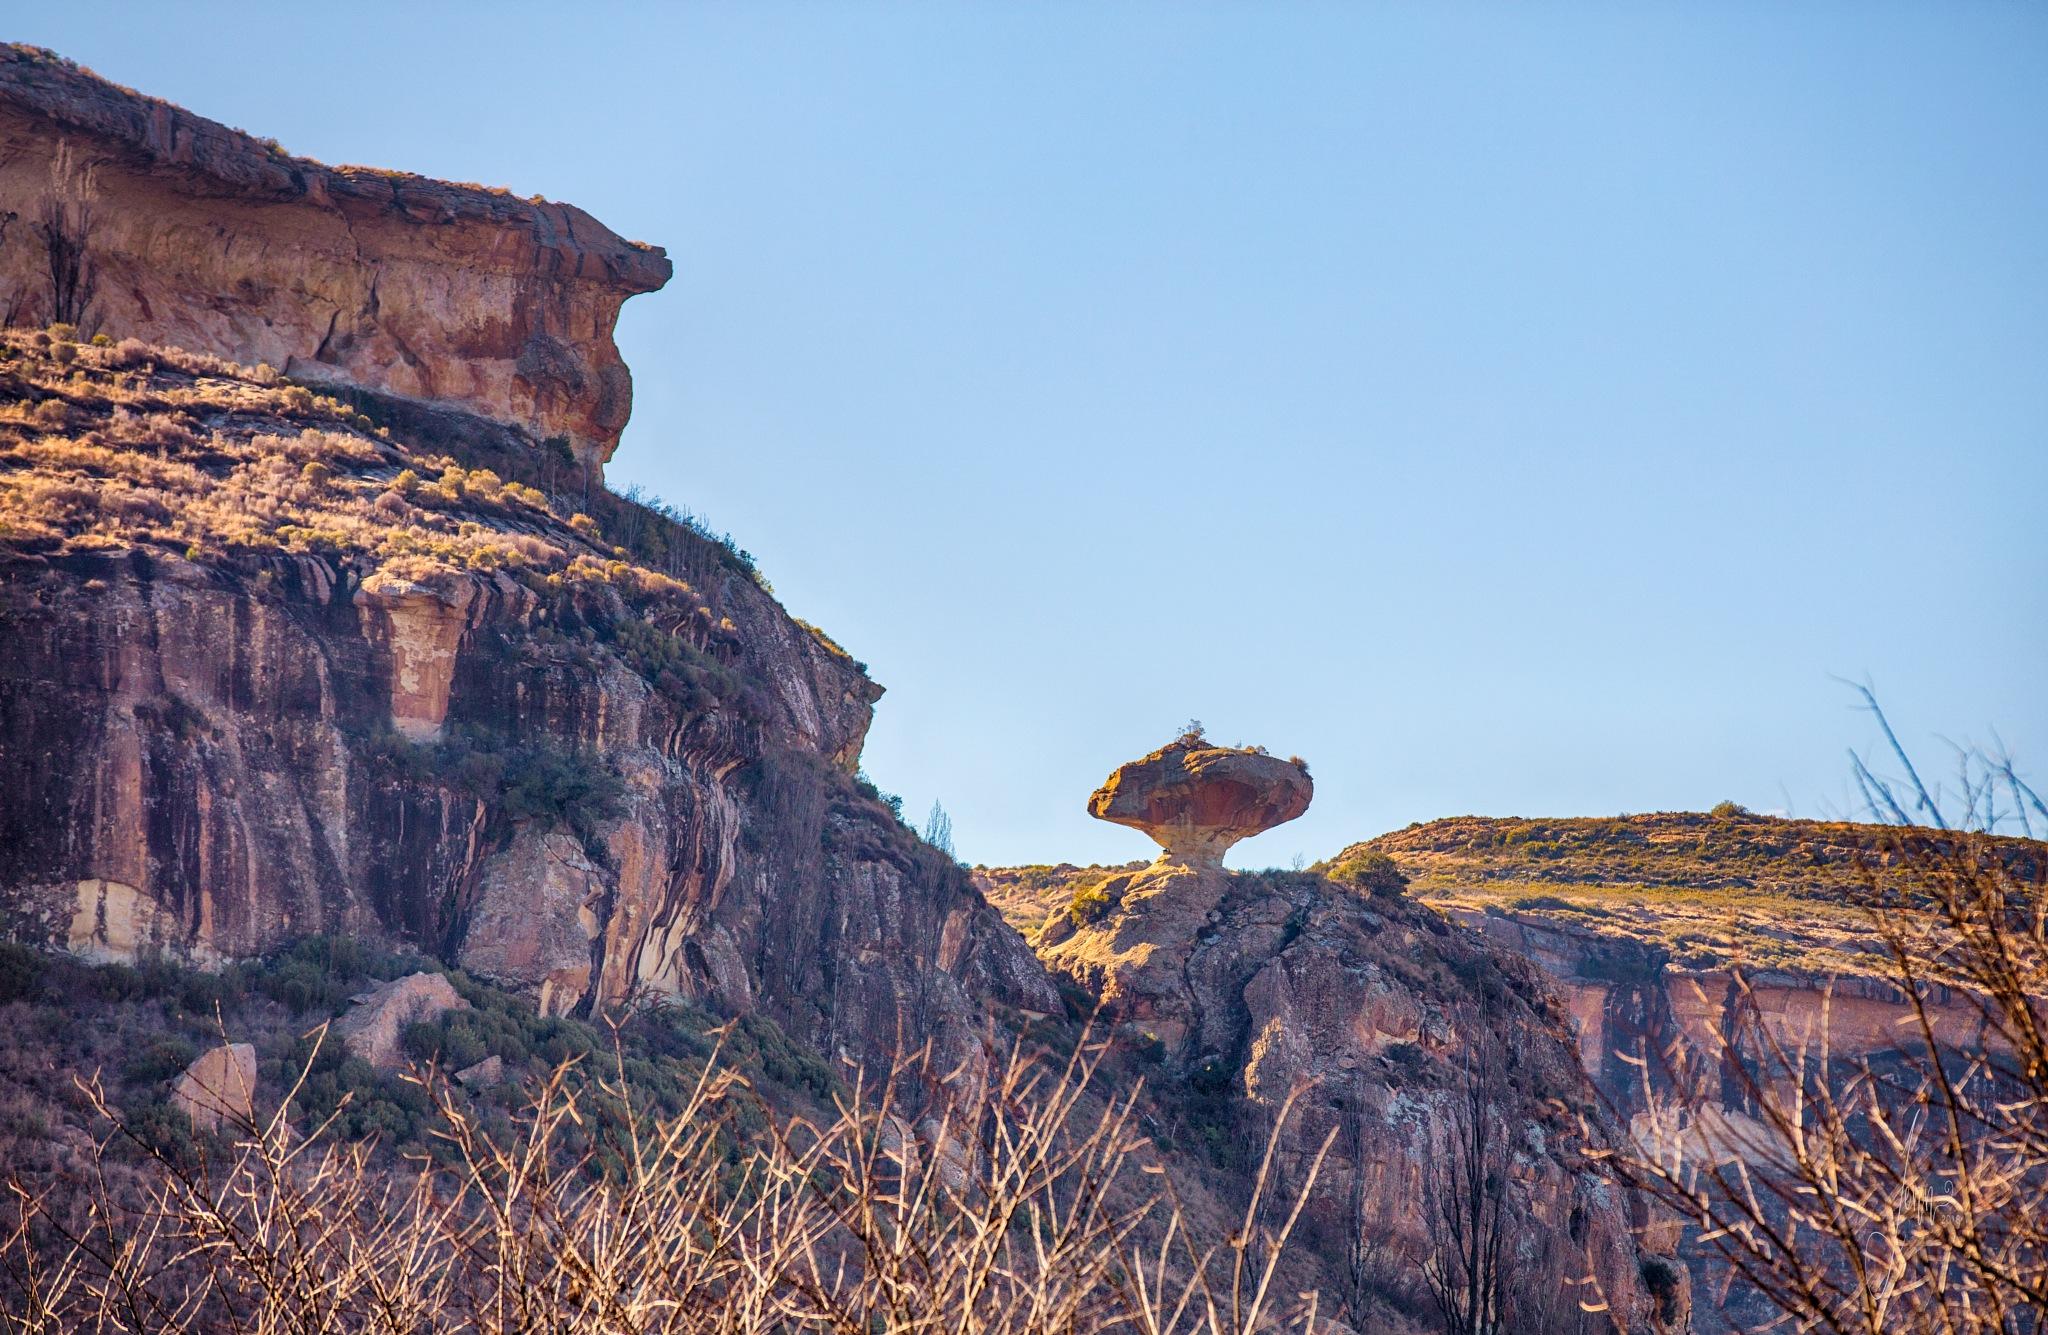 Mushroom Rock by Jennie